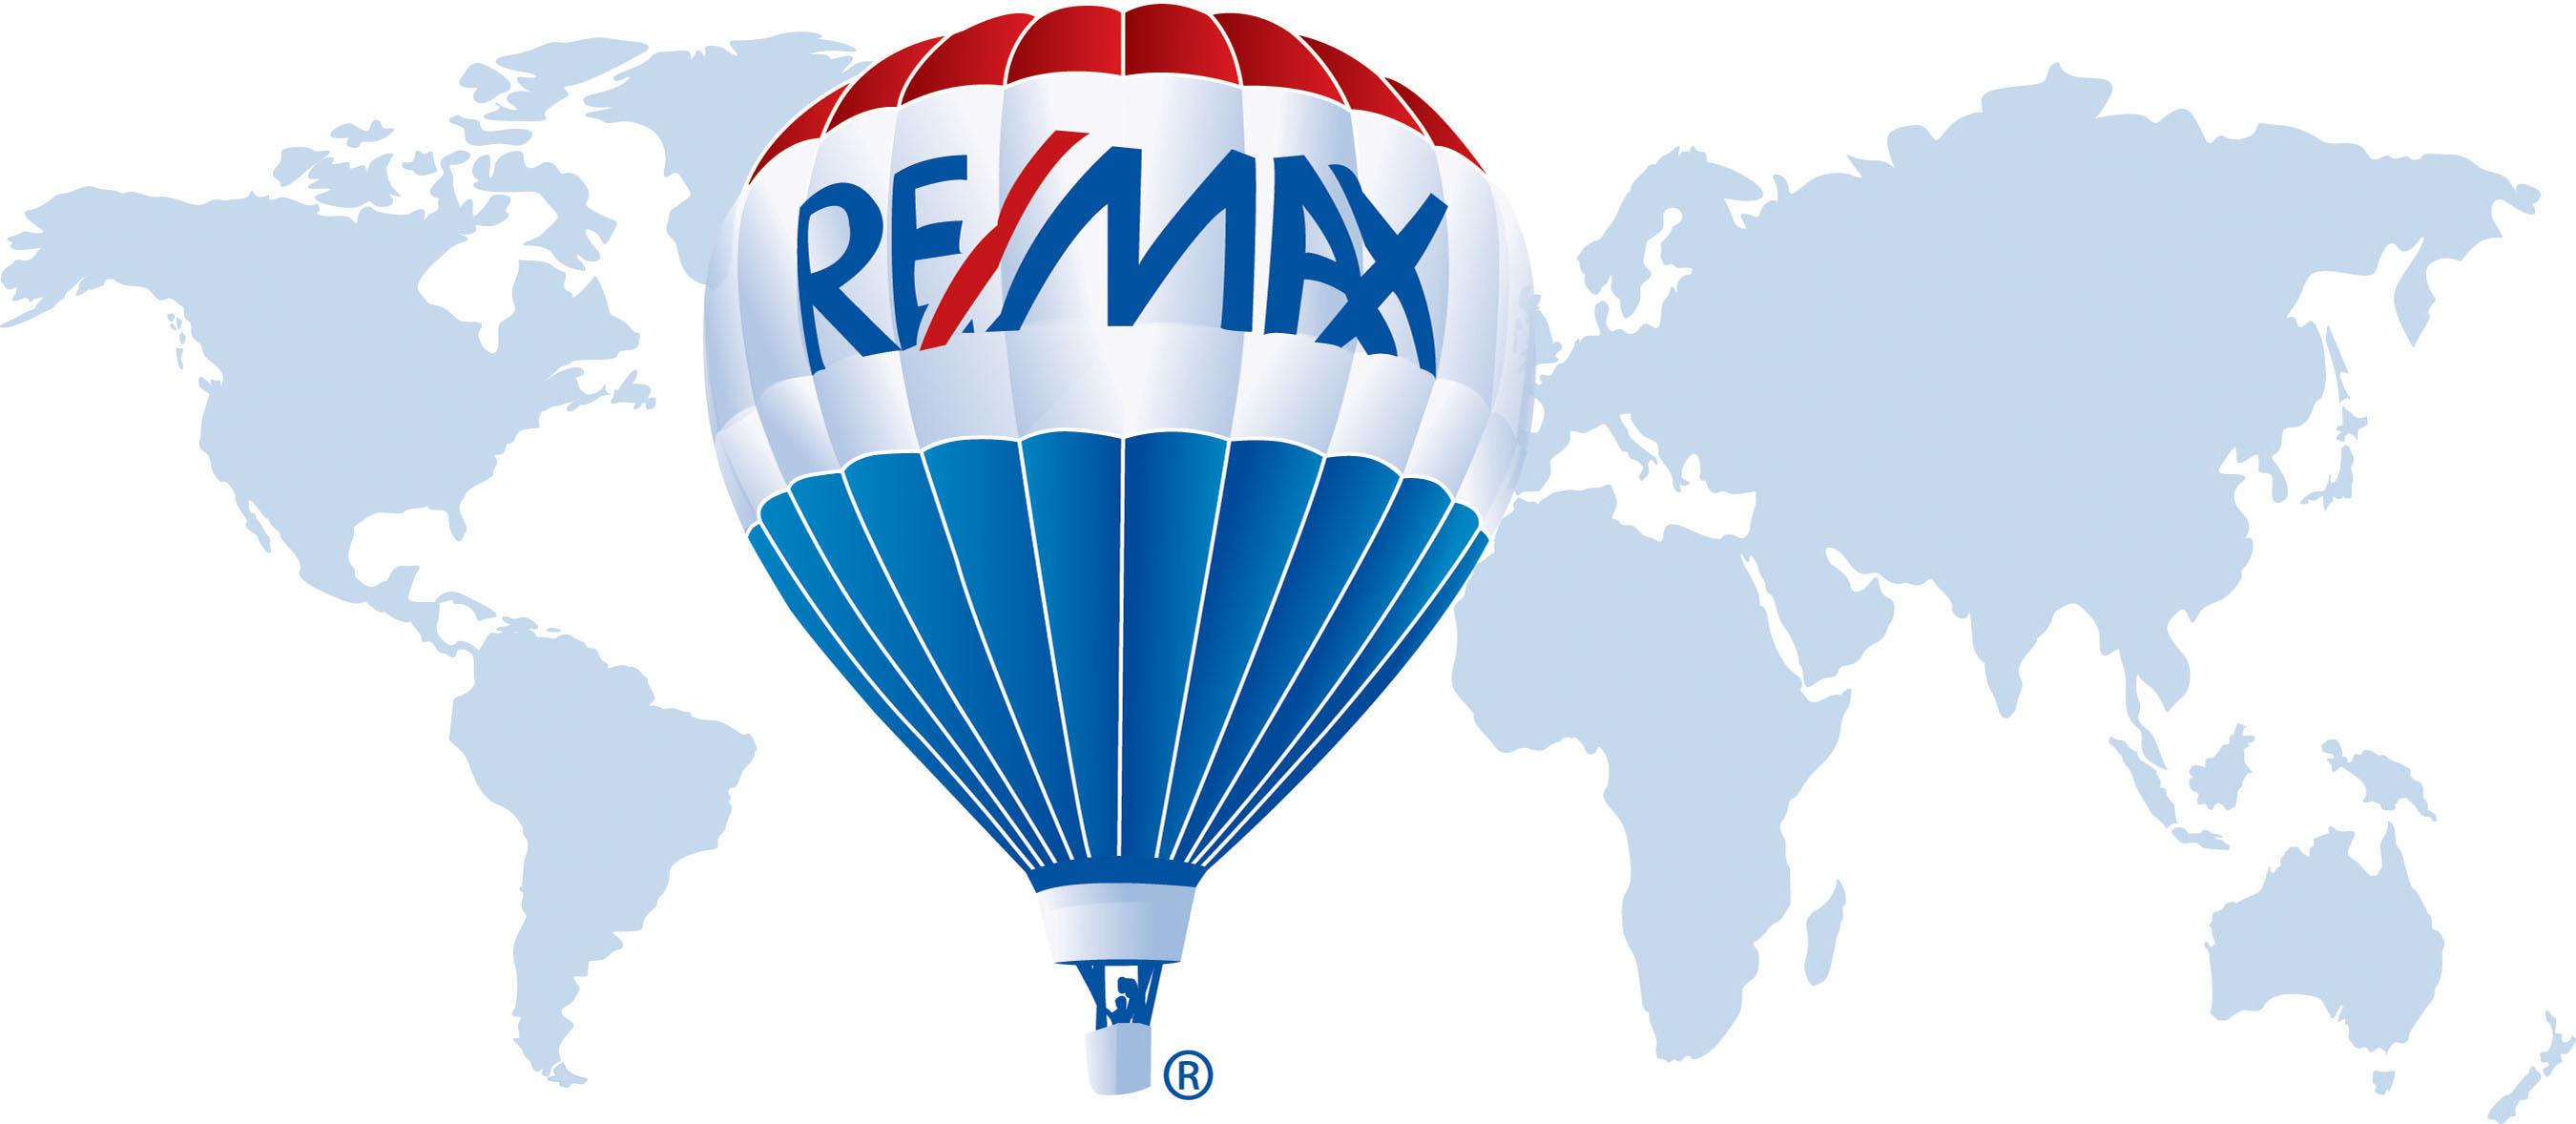 max re realtors hispanic influential engages